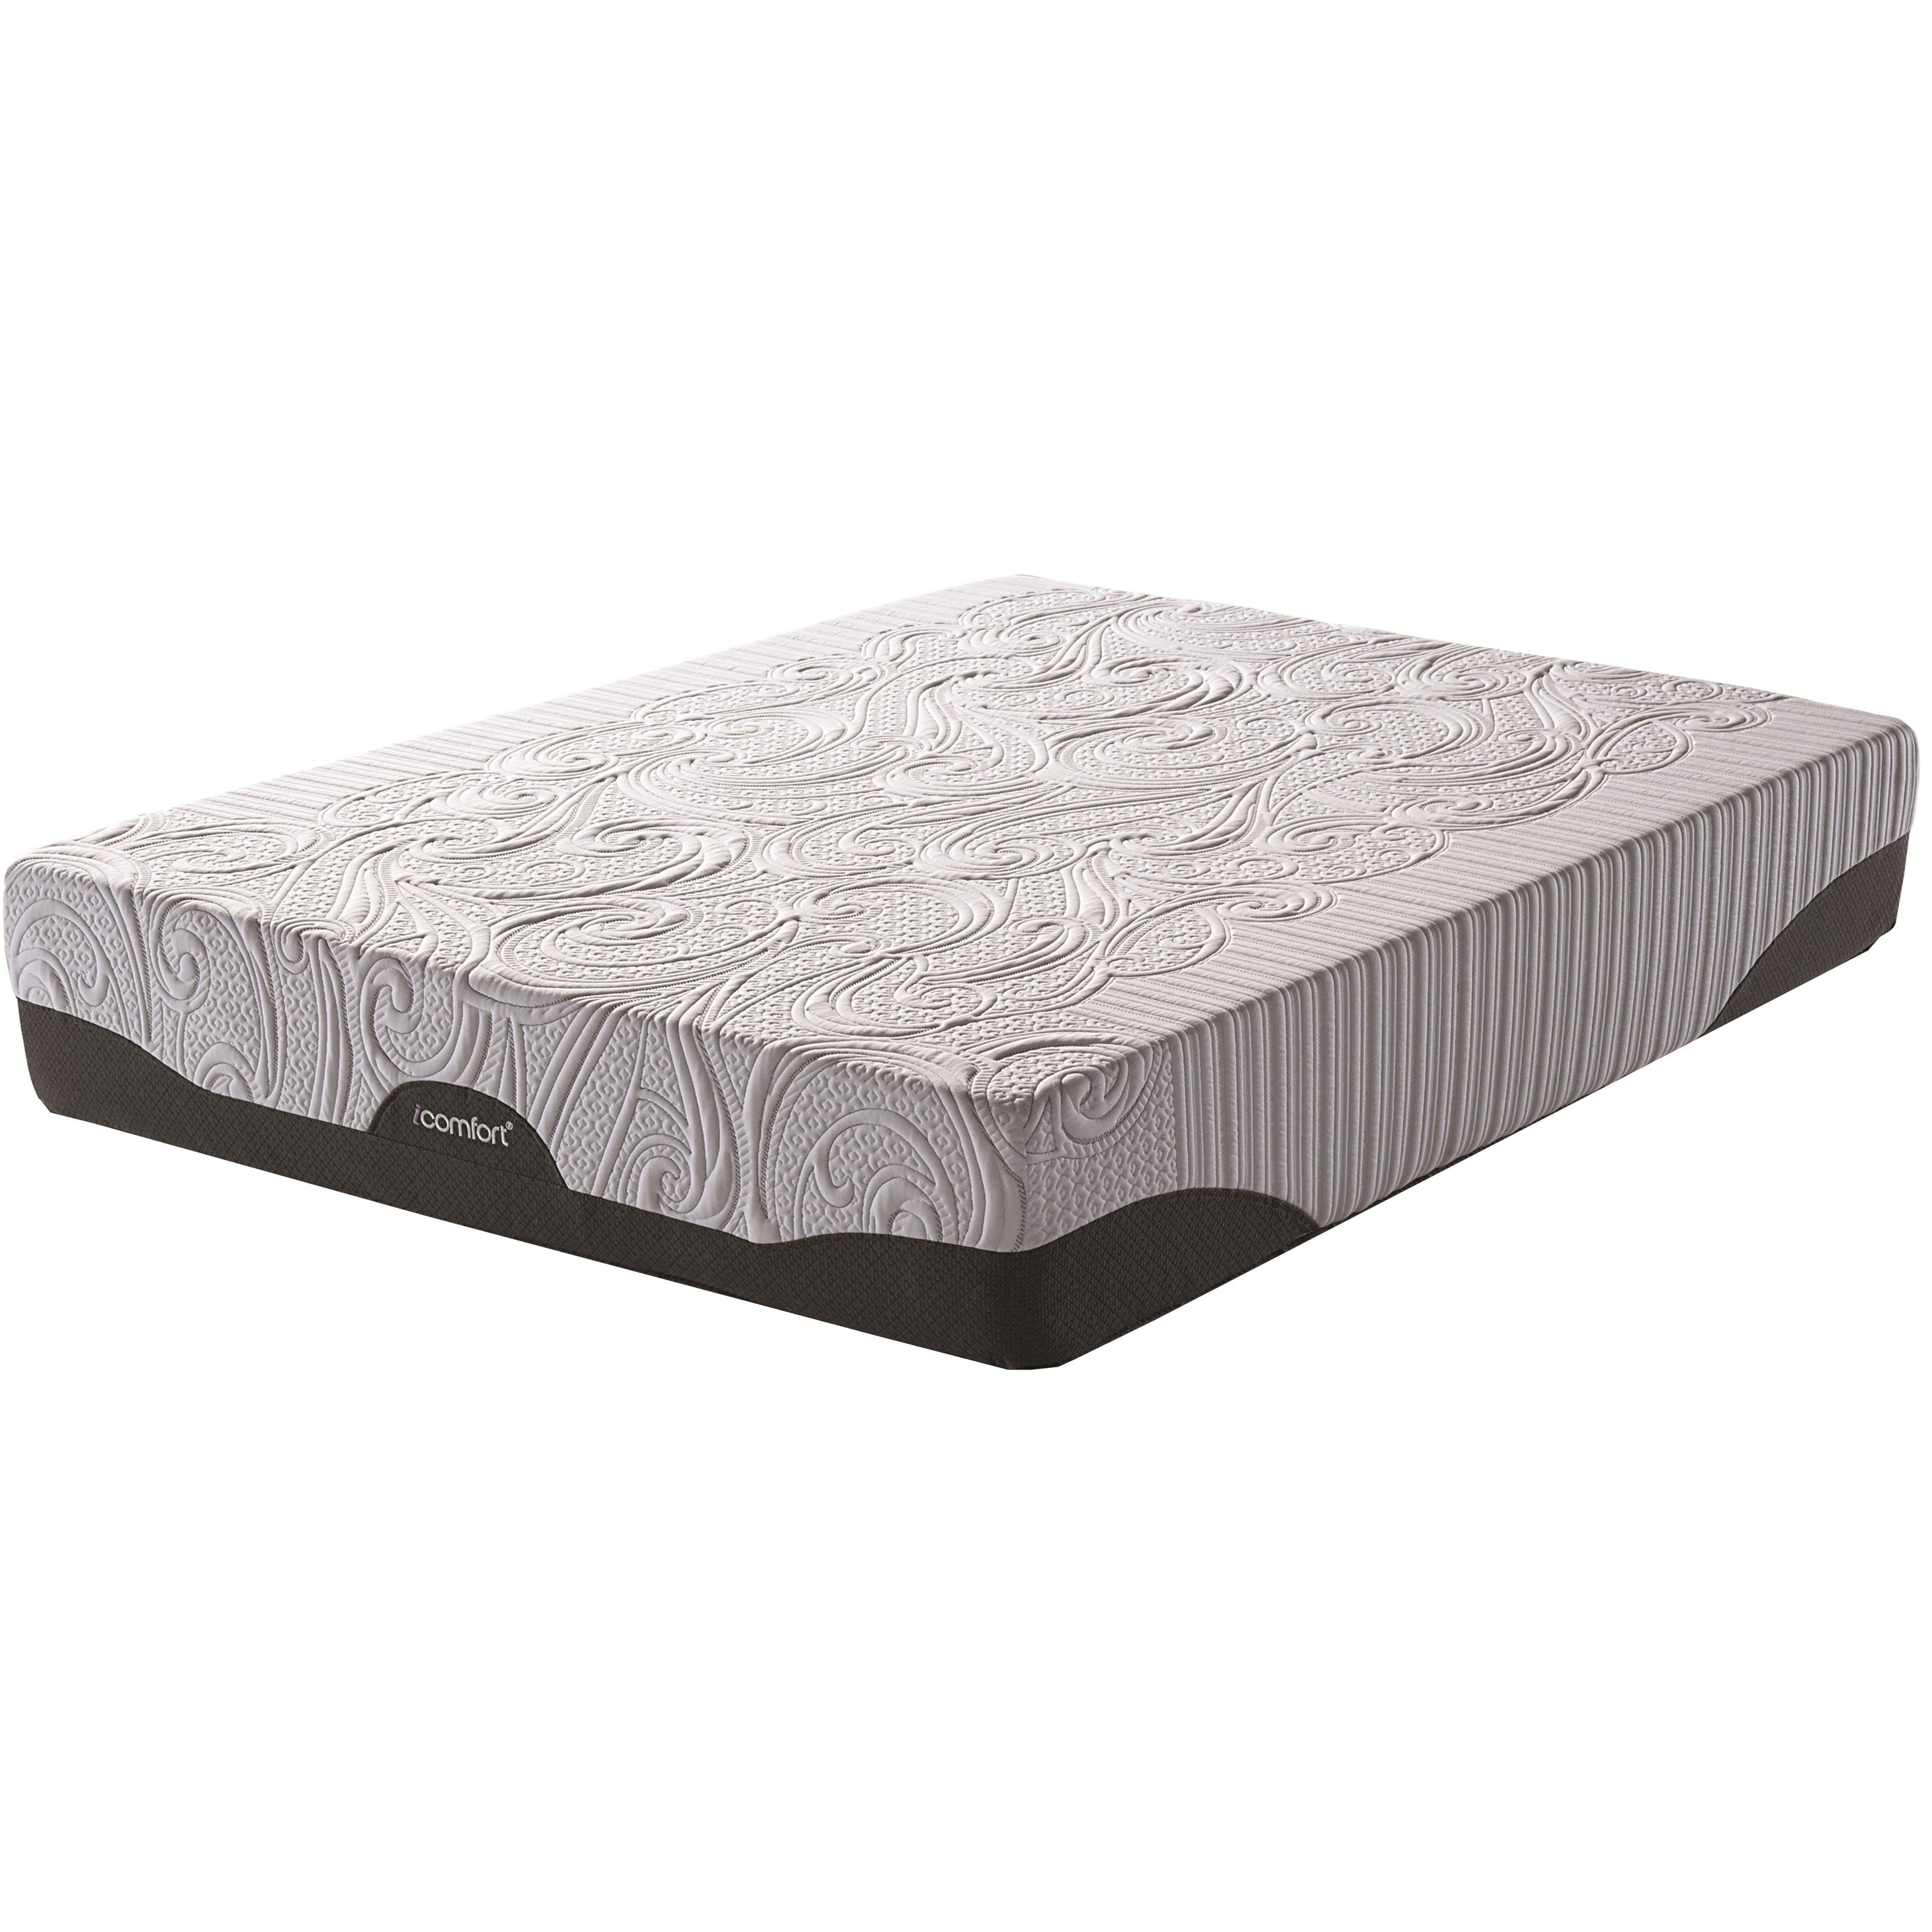 Serta iComfort® Prodigy EverFeel™ Queen Mattress - Item Number: 824218Q